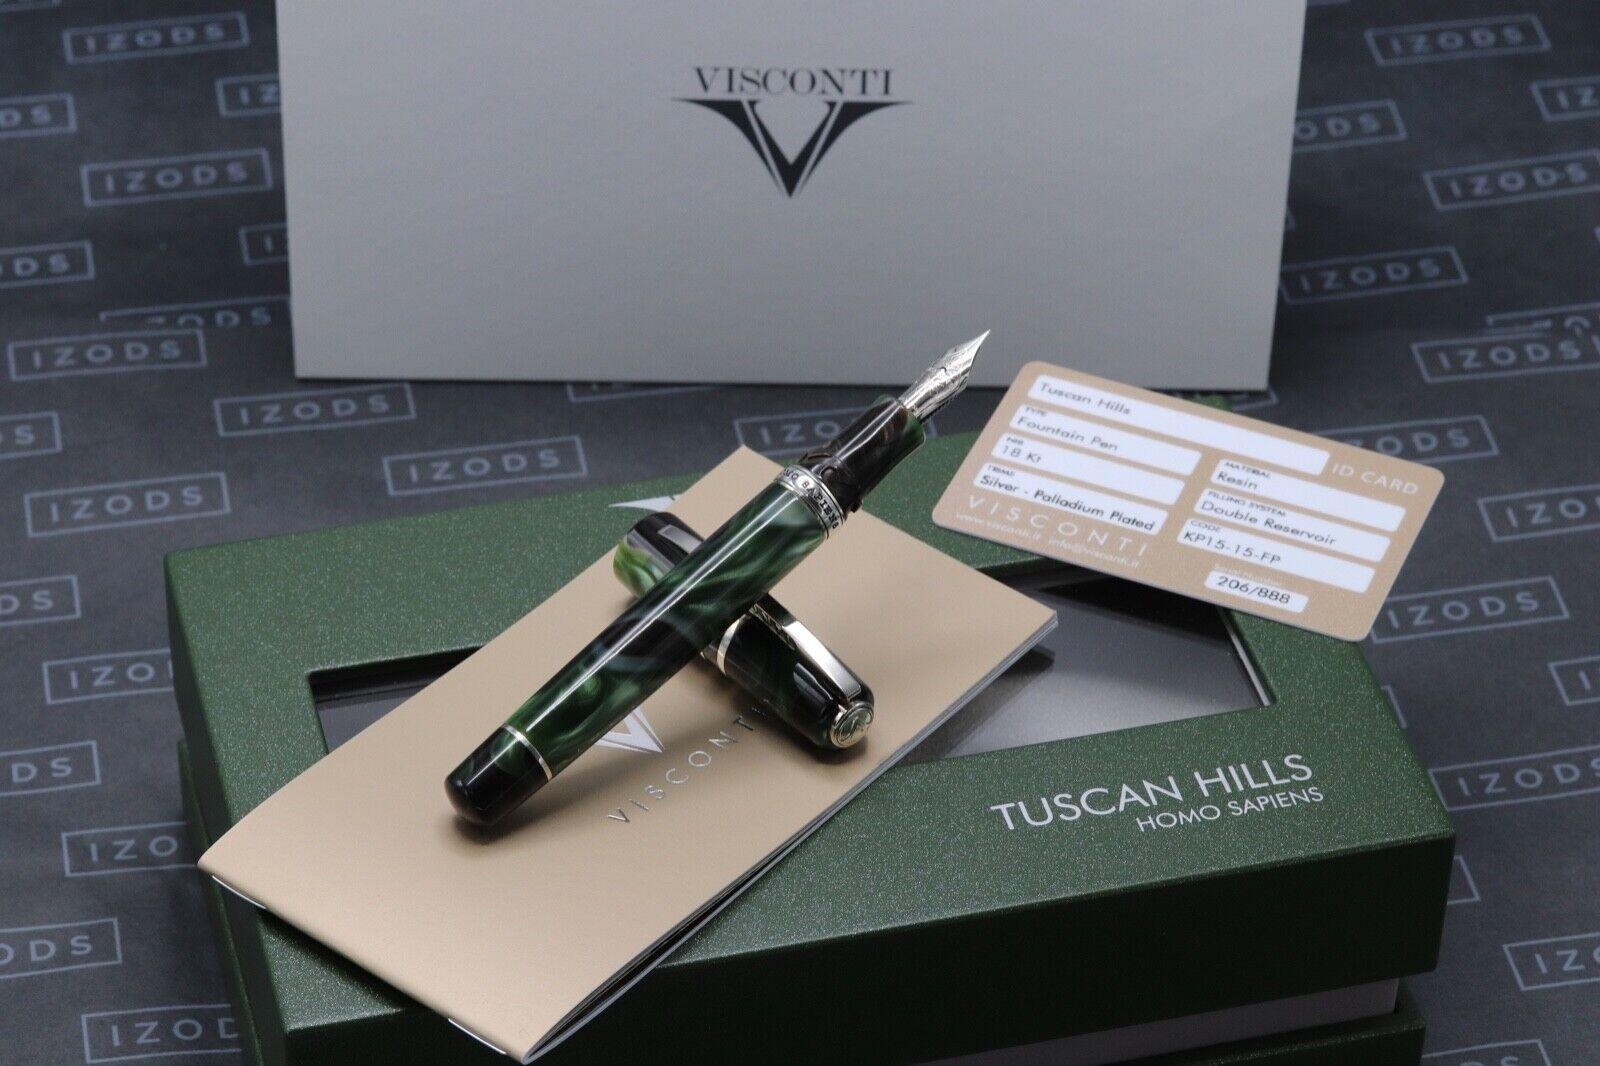 Visconti Homo Sapiens Tuscan Hills Limited Edition Fountain Pen - EF - UNUSED